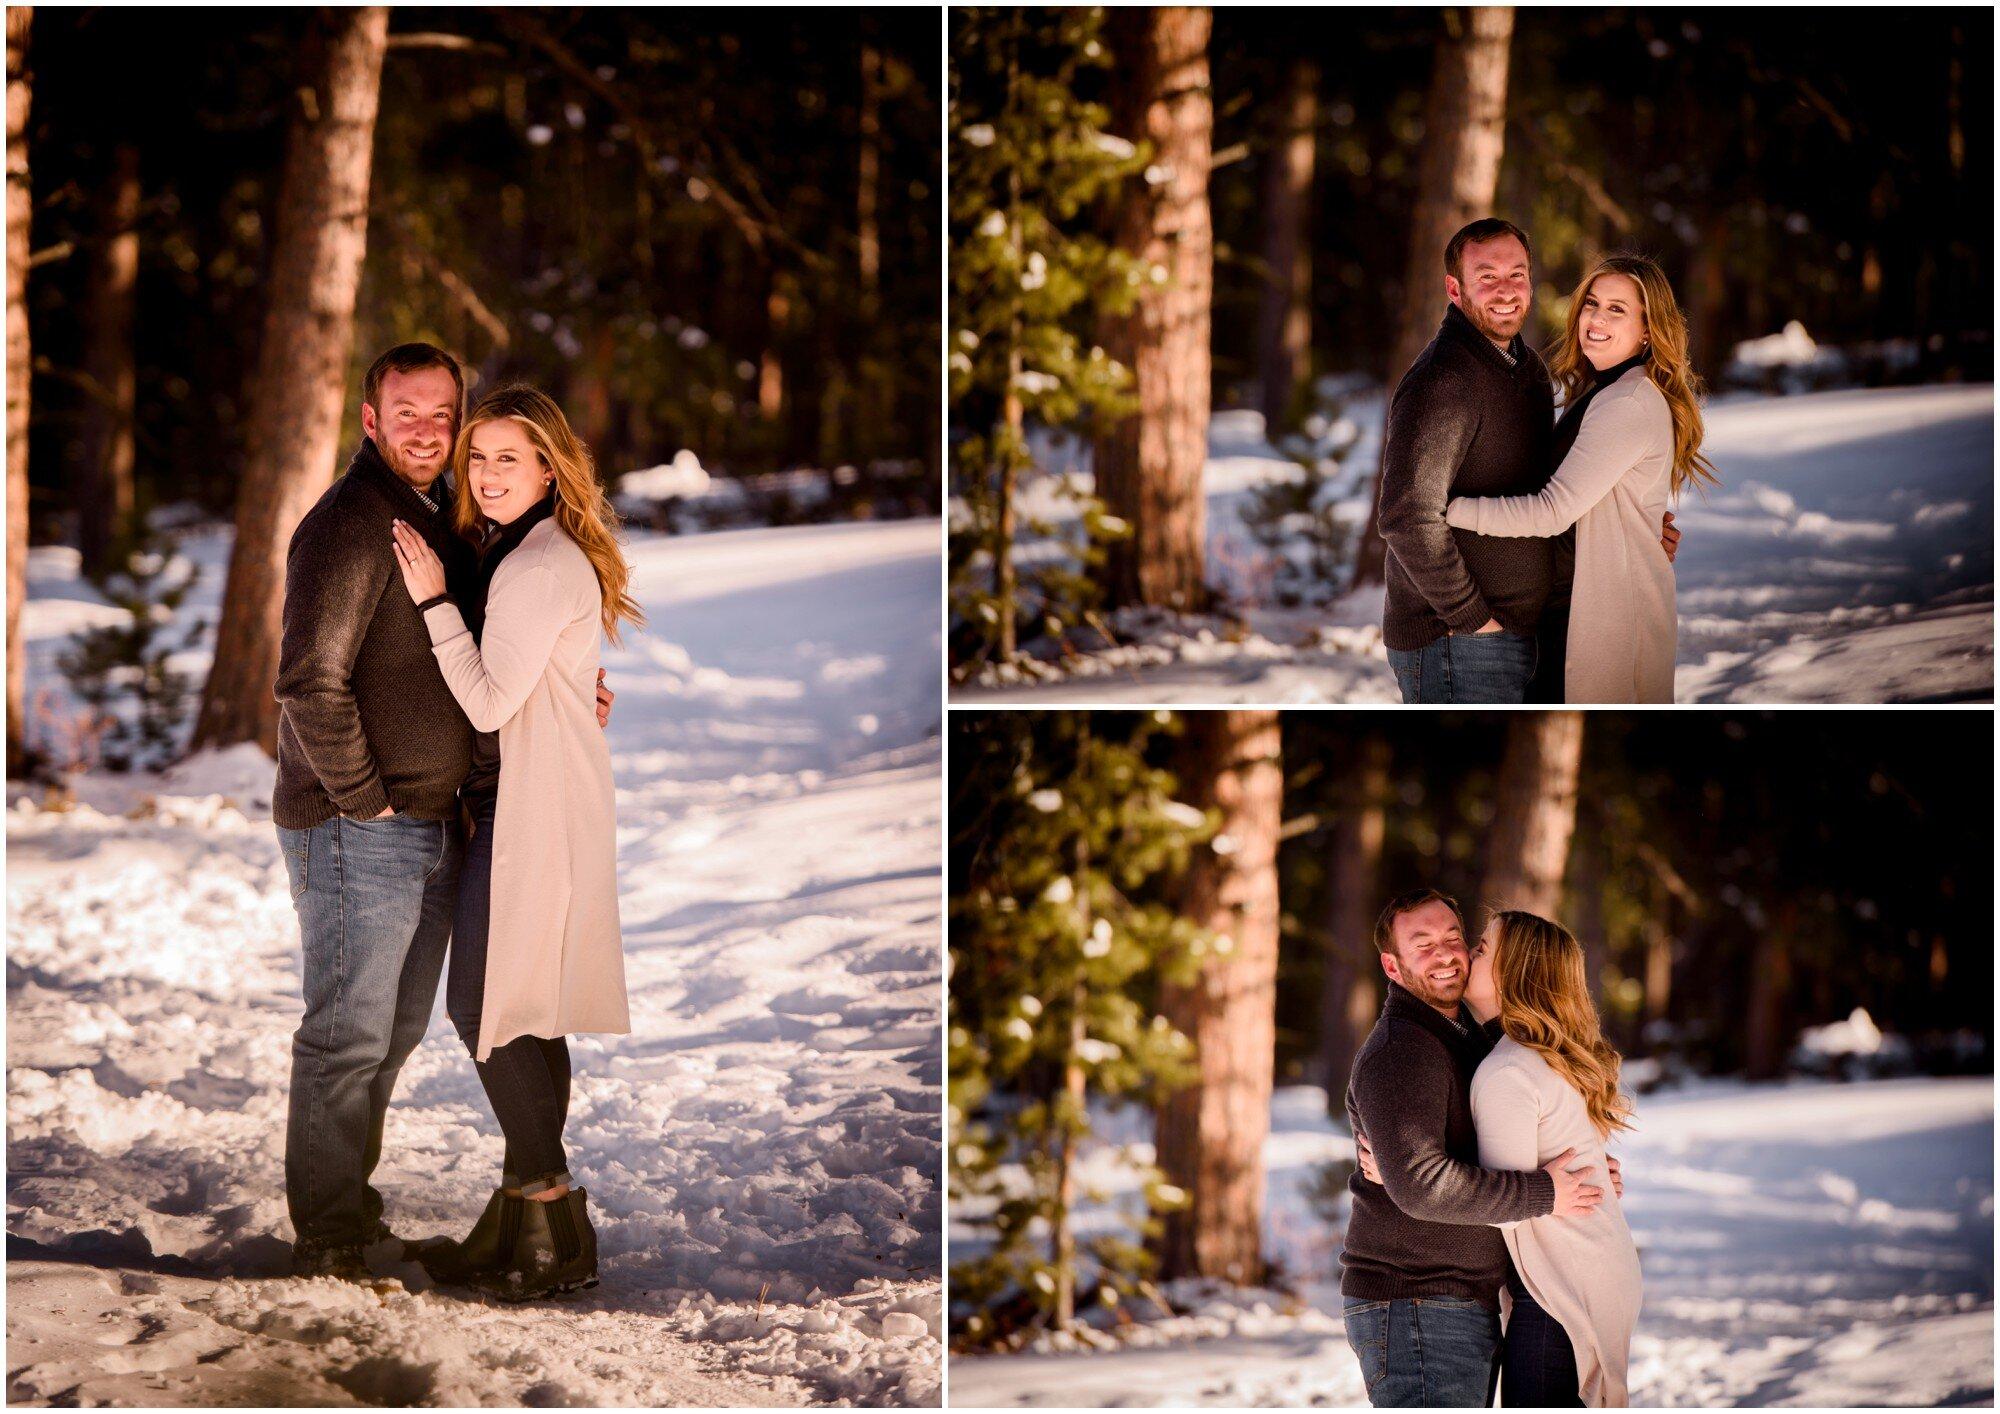 Evergreen colorado engagement photos